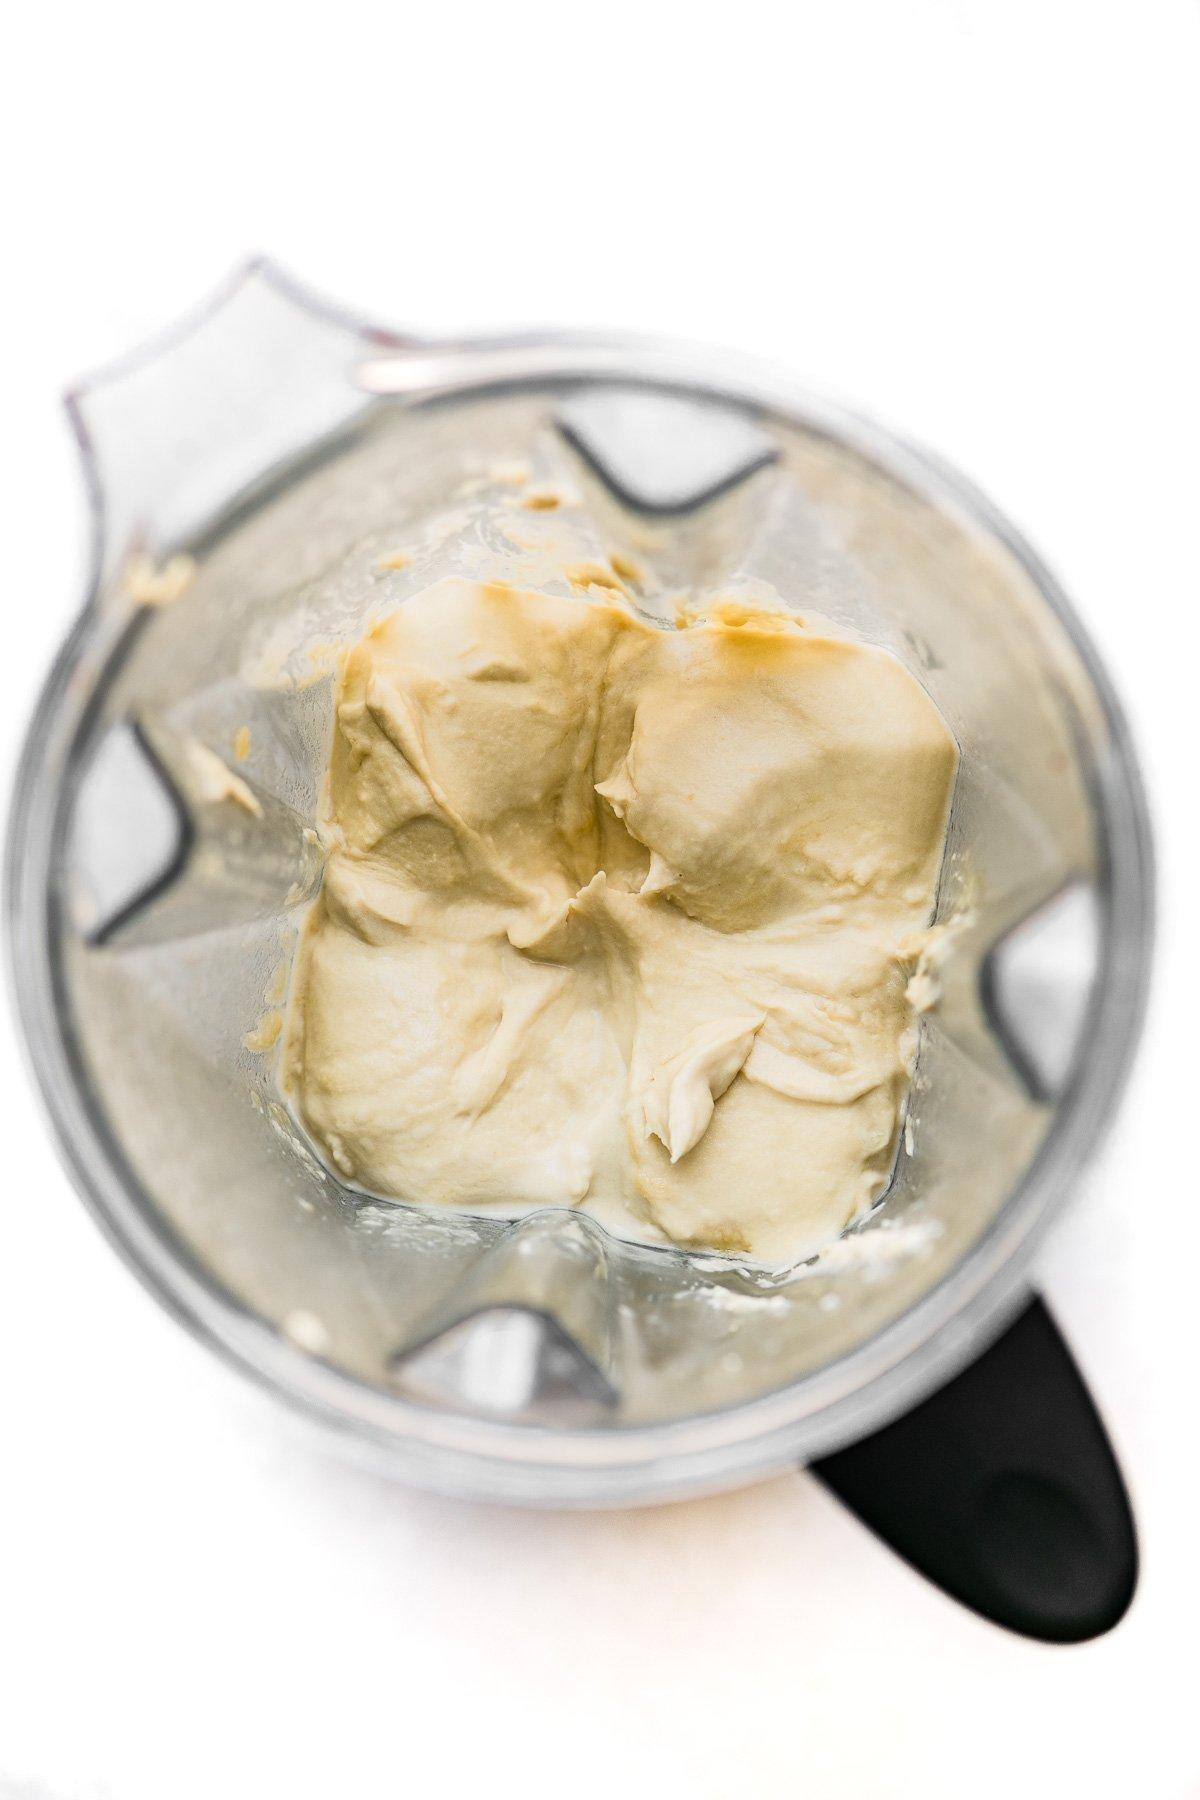 blending hummus in a Vitamix